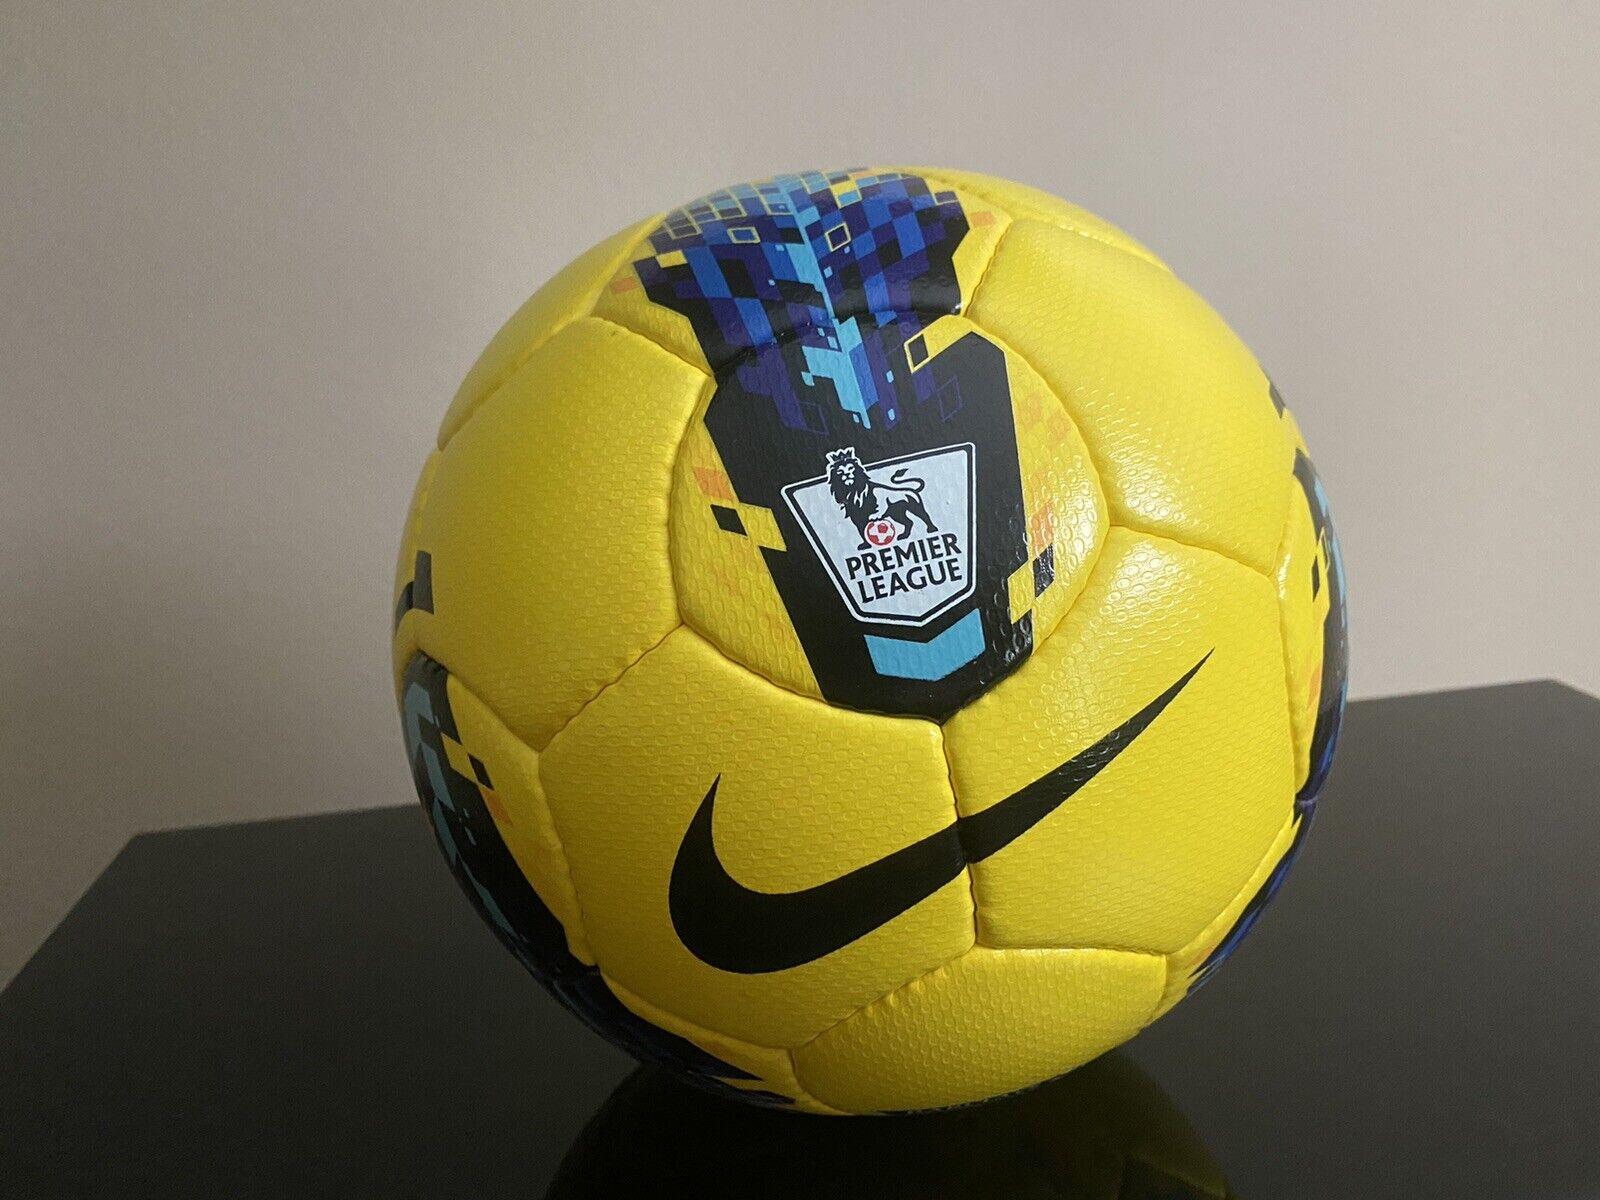 Обои nike, премьер-лига, football, Barclays premier league, мяч. Спорт foto 7